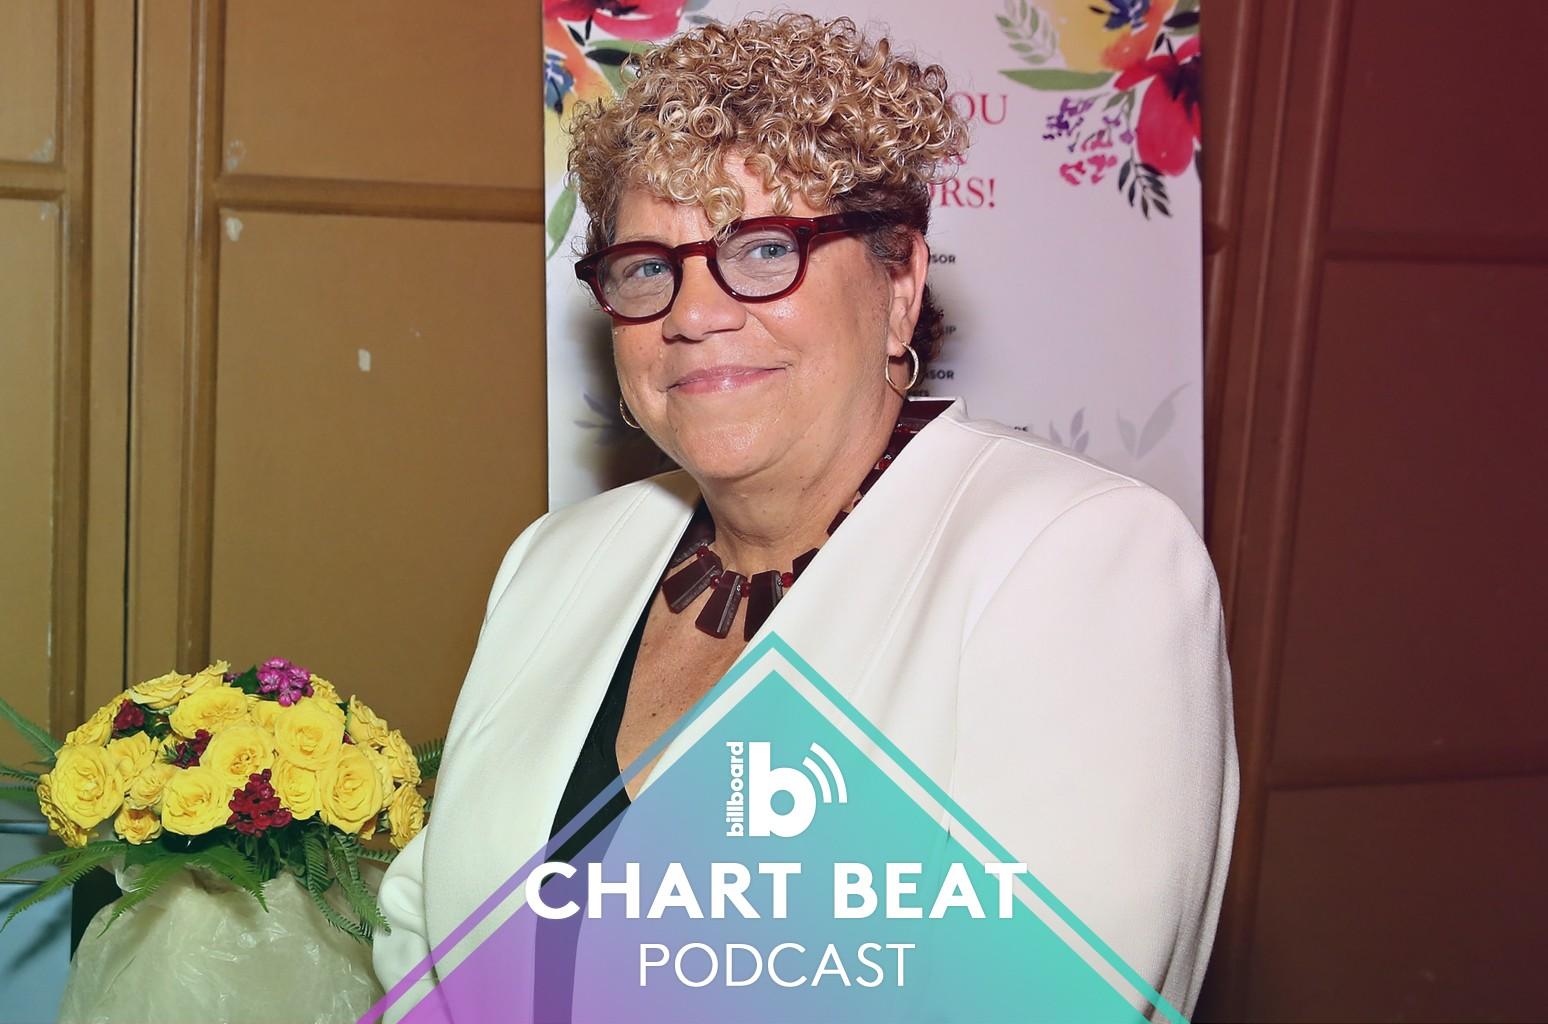 Chart Beat Podcast featuring: Rita Houston